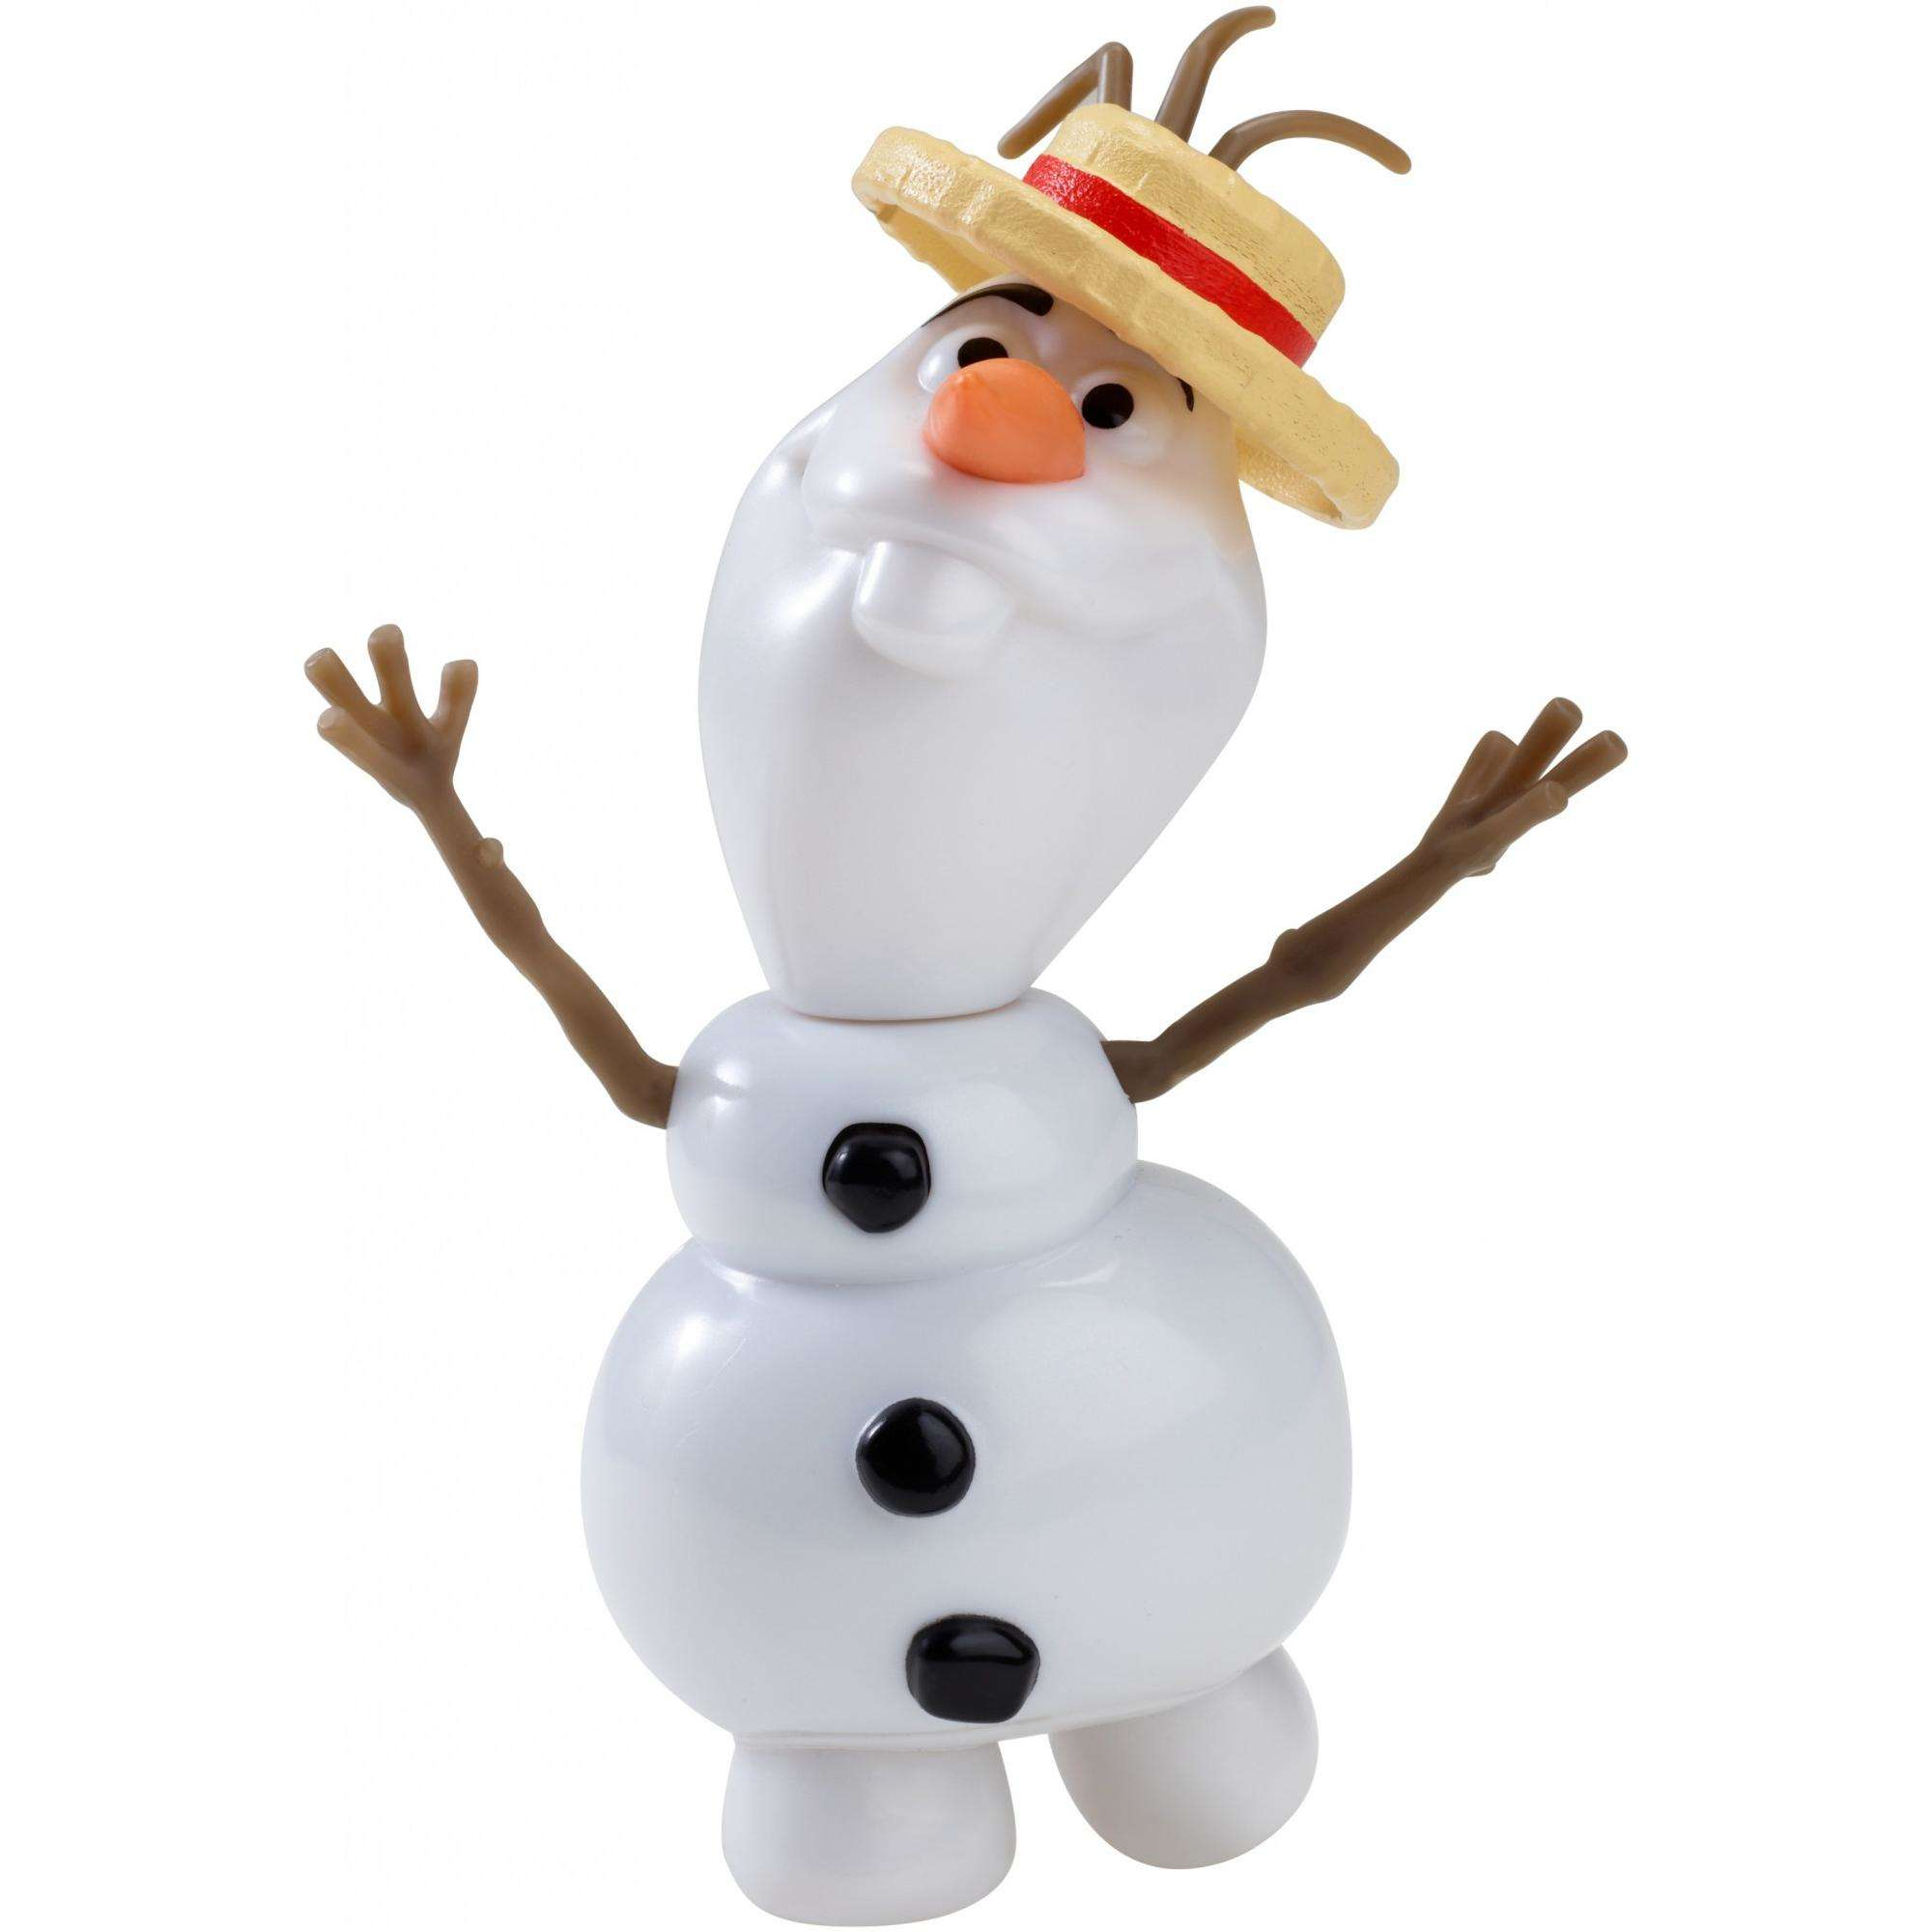 Disney Frozen Summer Singin' Olaf